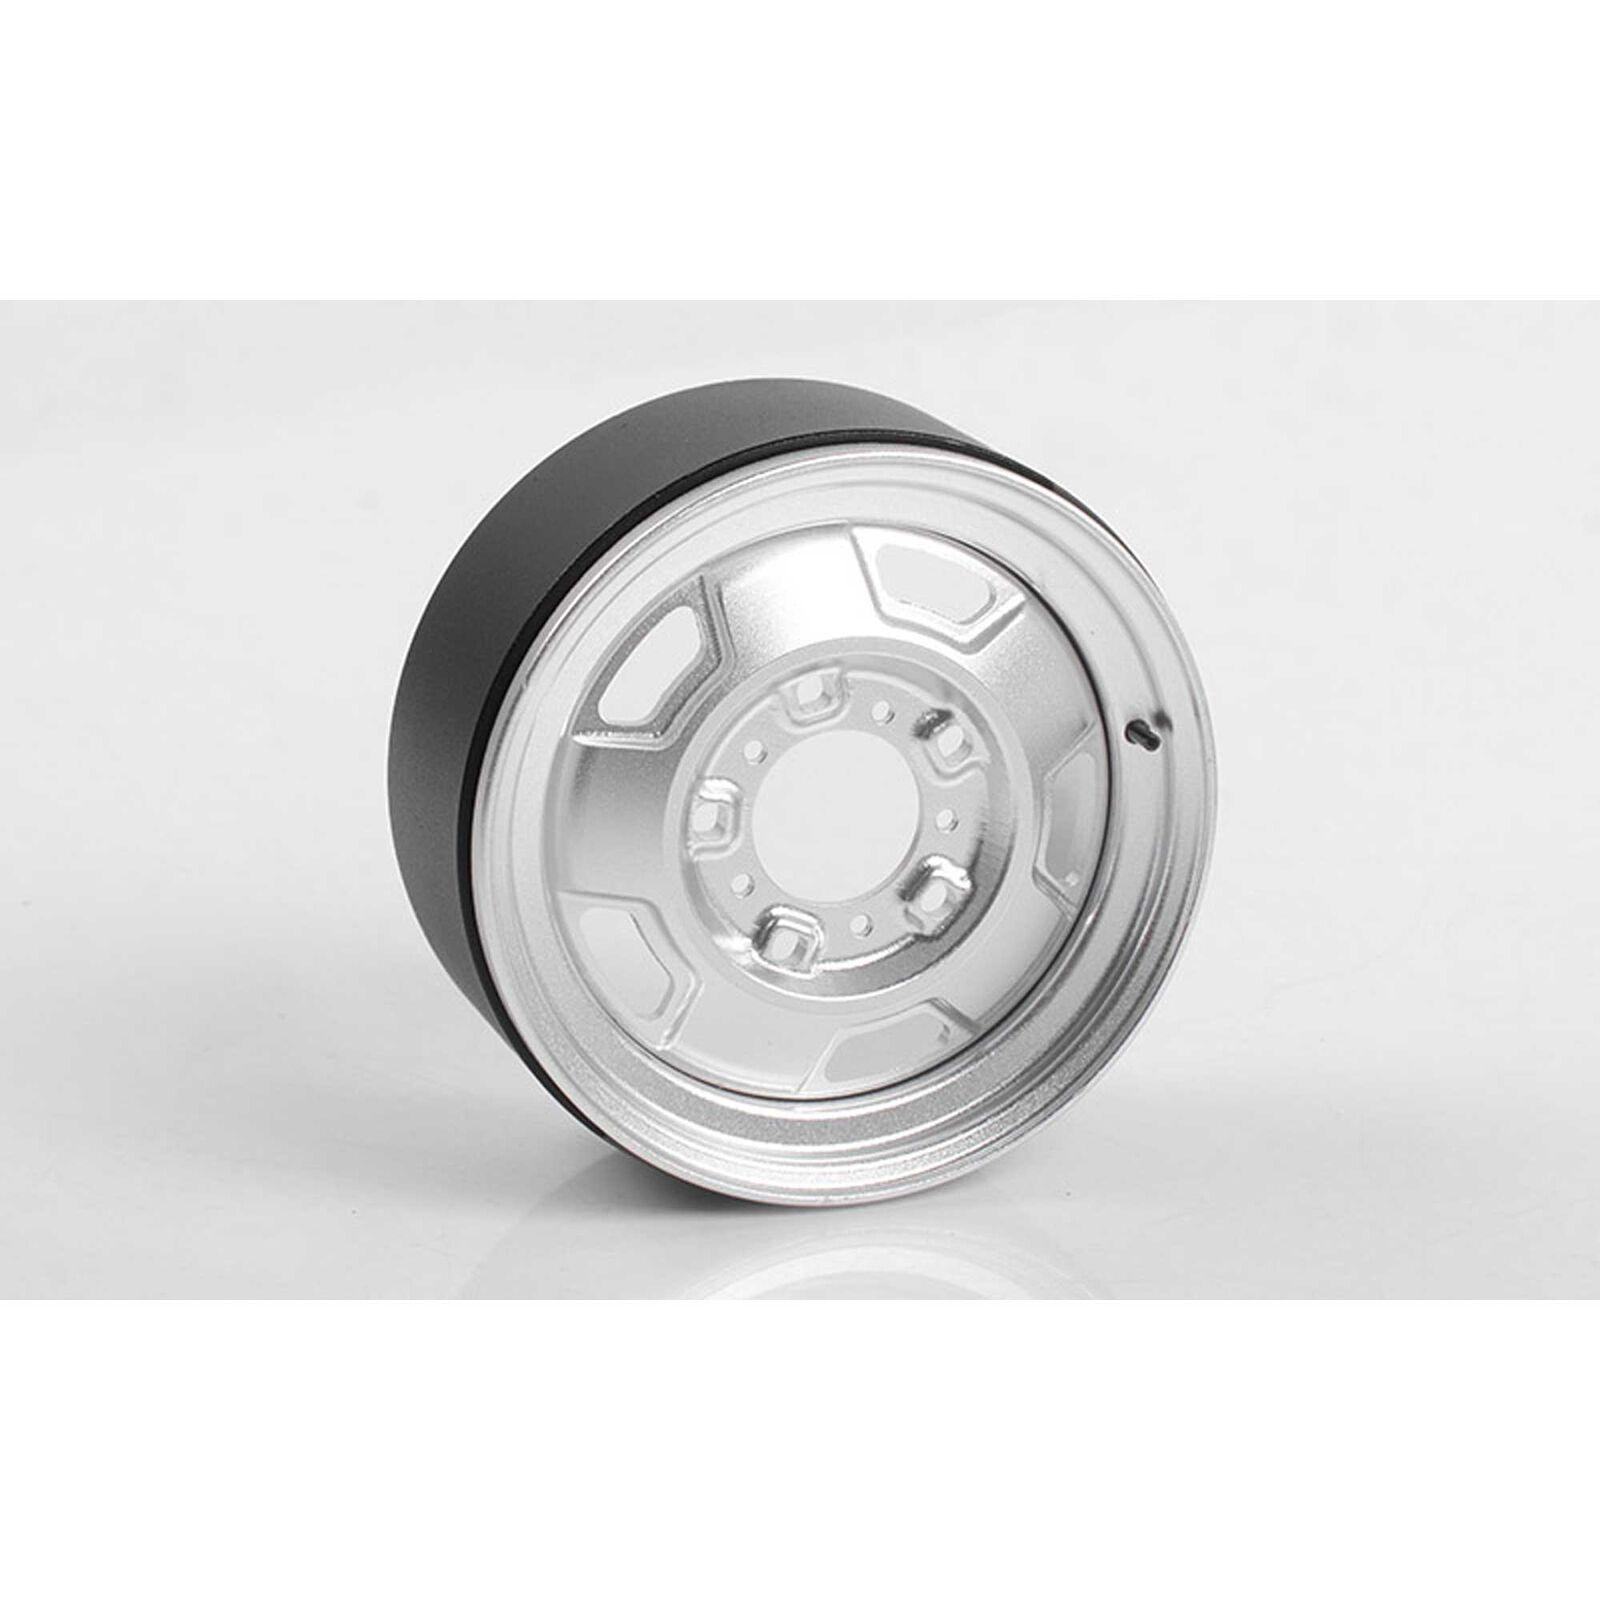 "Single Nagi 2.8"" Wheel: CRS 1/6 Crawler"